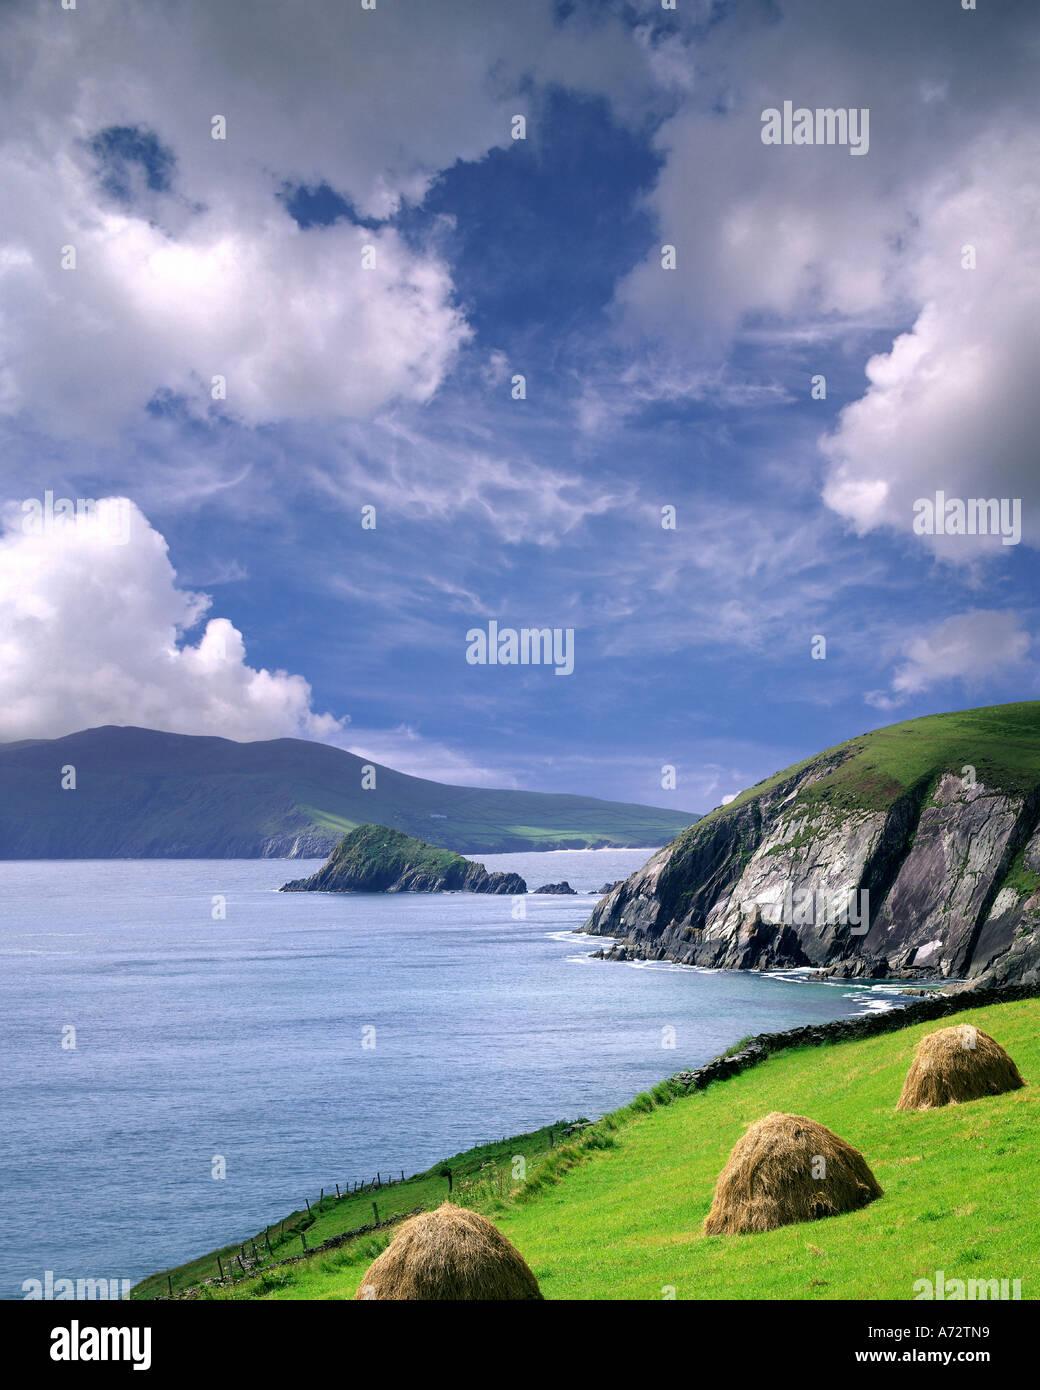 IE - CO. KERRY:  Slea Head on Dingle Peninsula - Stock Image